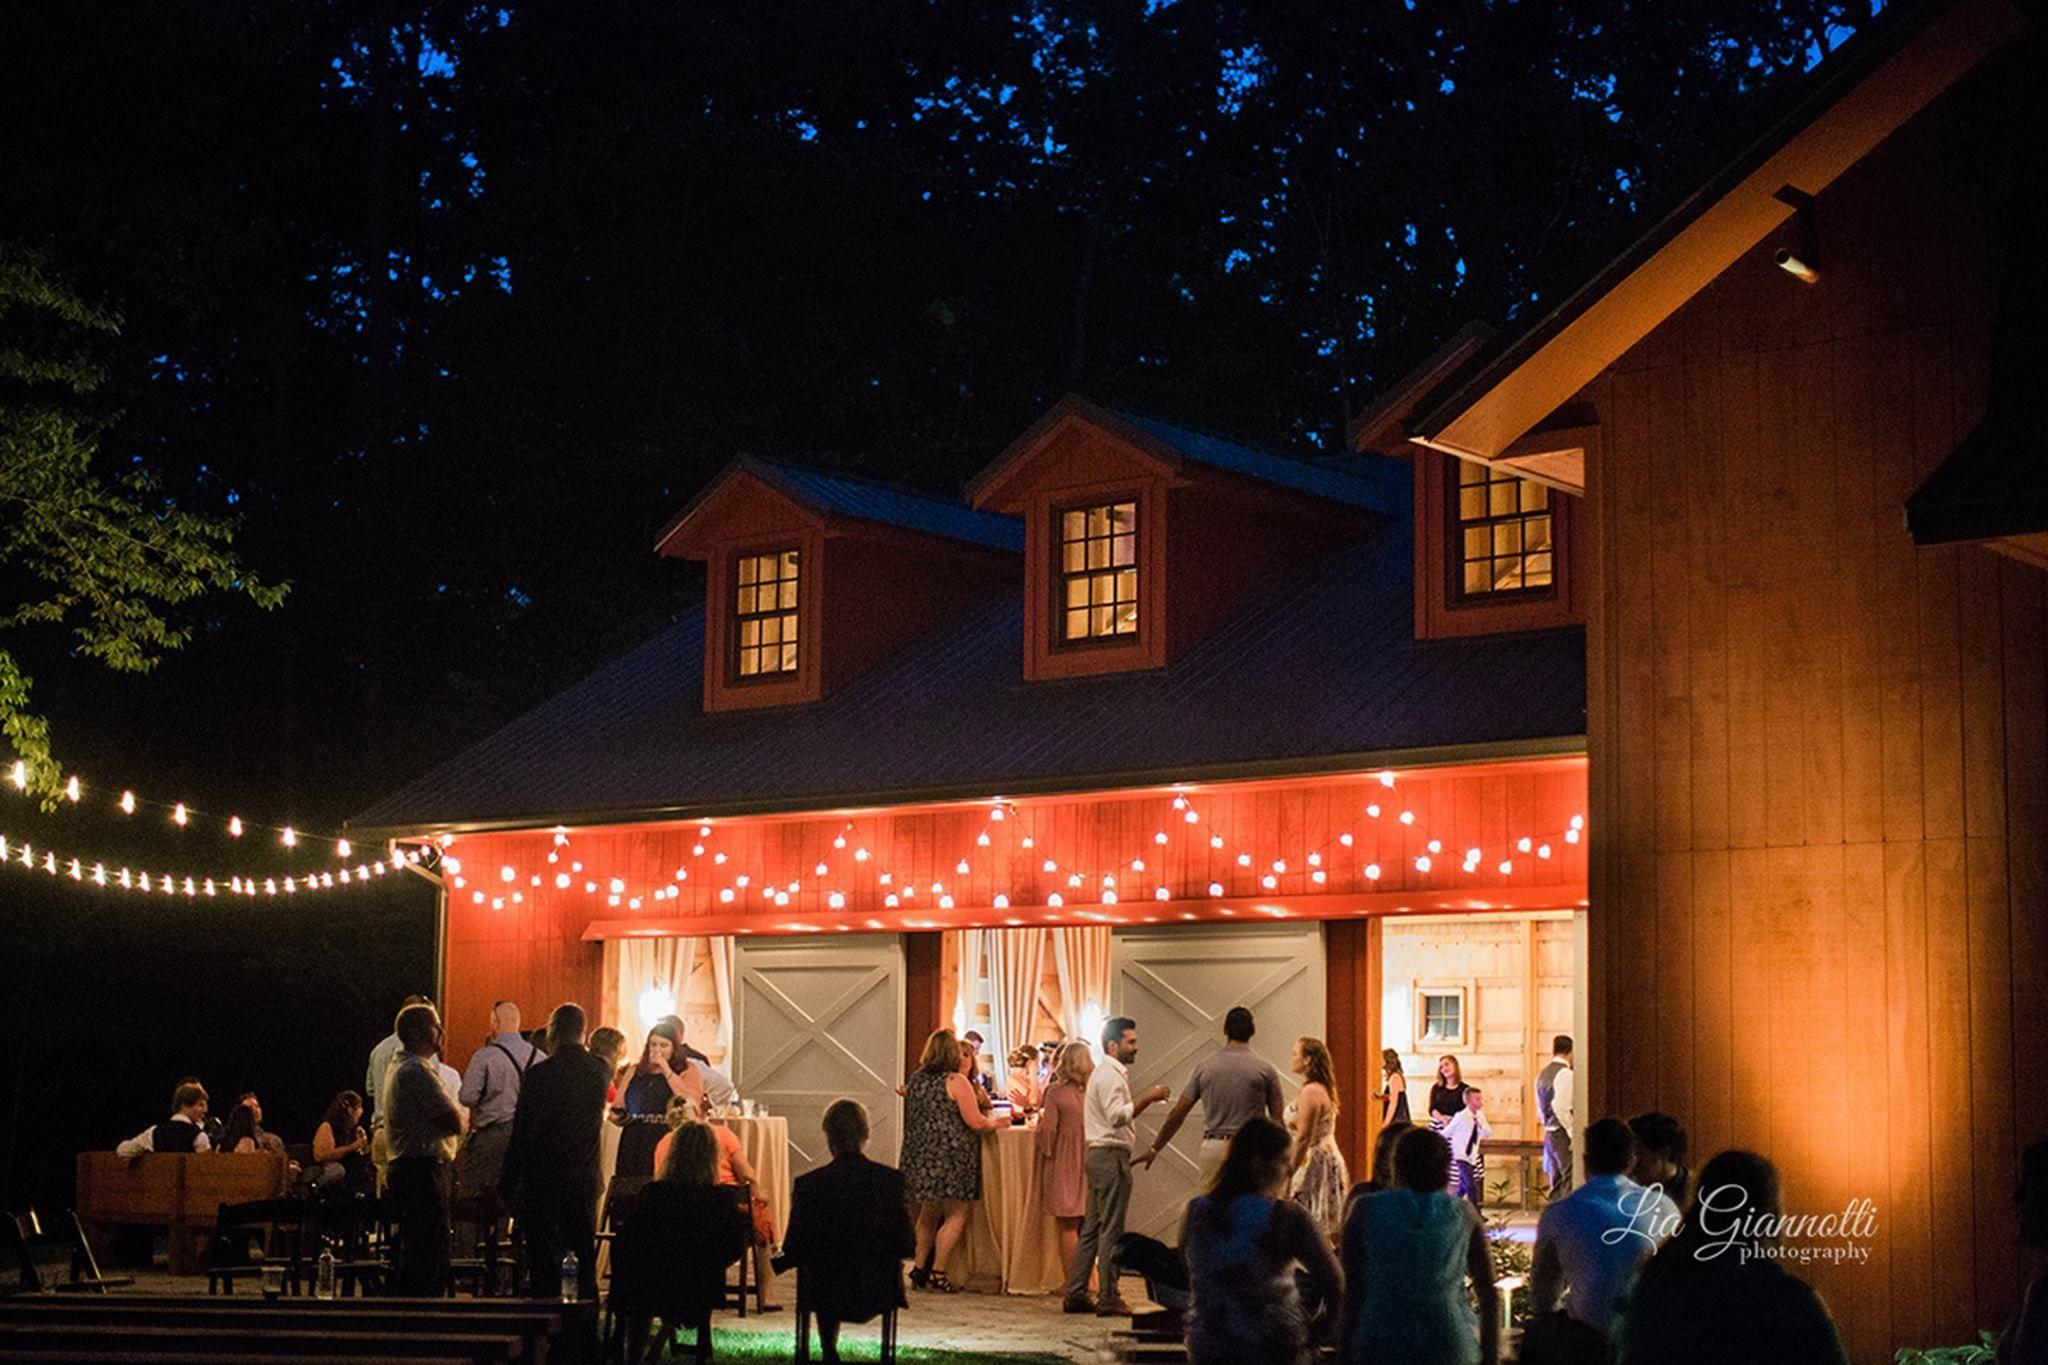 Gable hill wedding barn located in southwest michigan